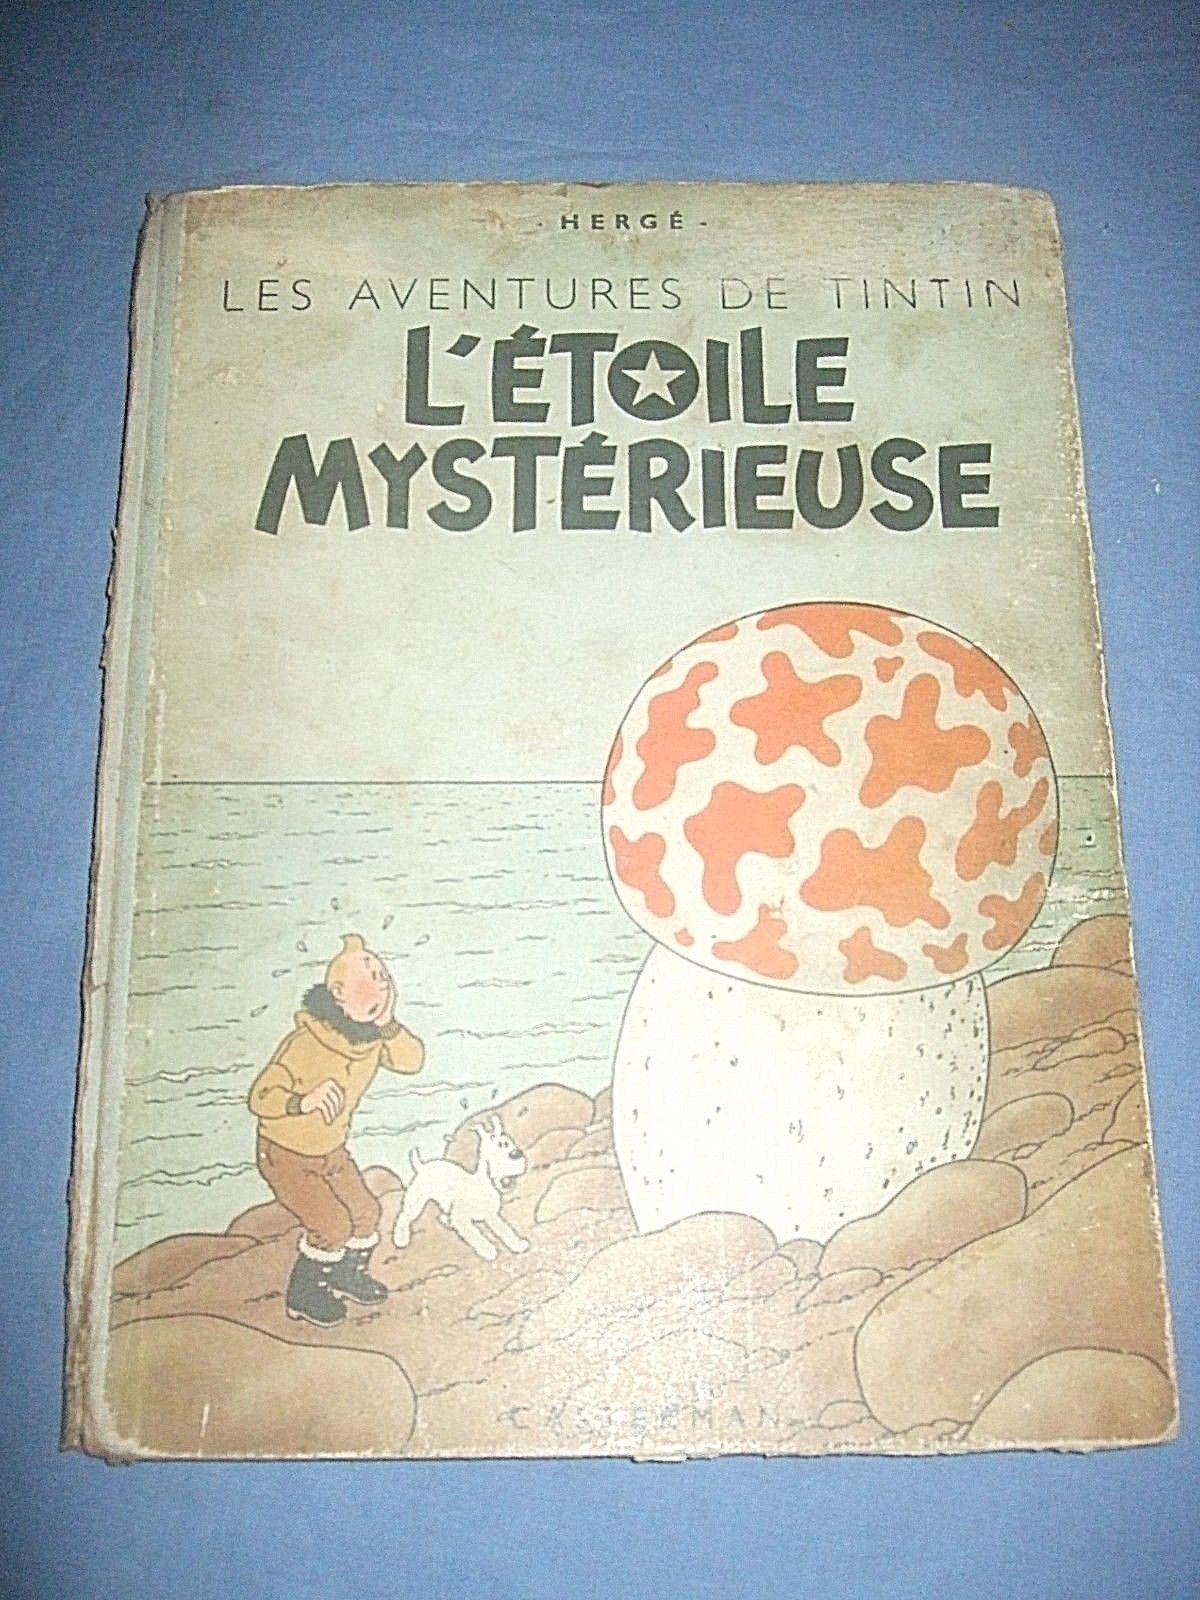 Tintin L'étoile mystérieuse B1 dos bleu de 1946 Papier épais